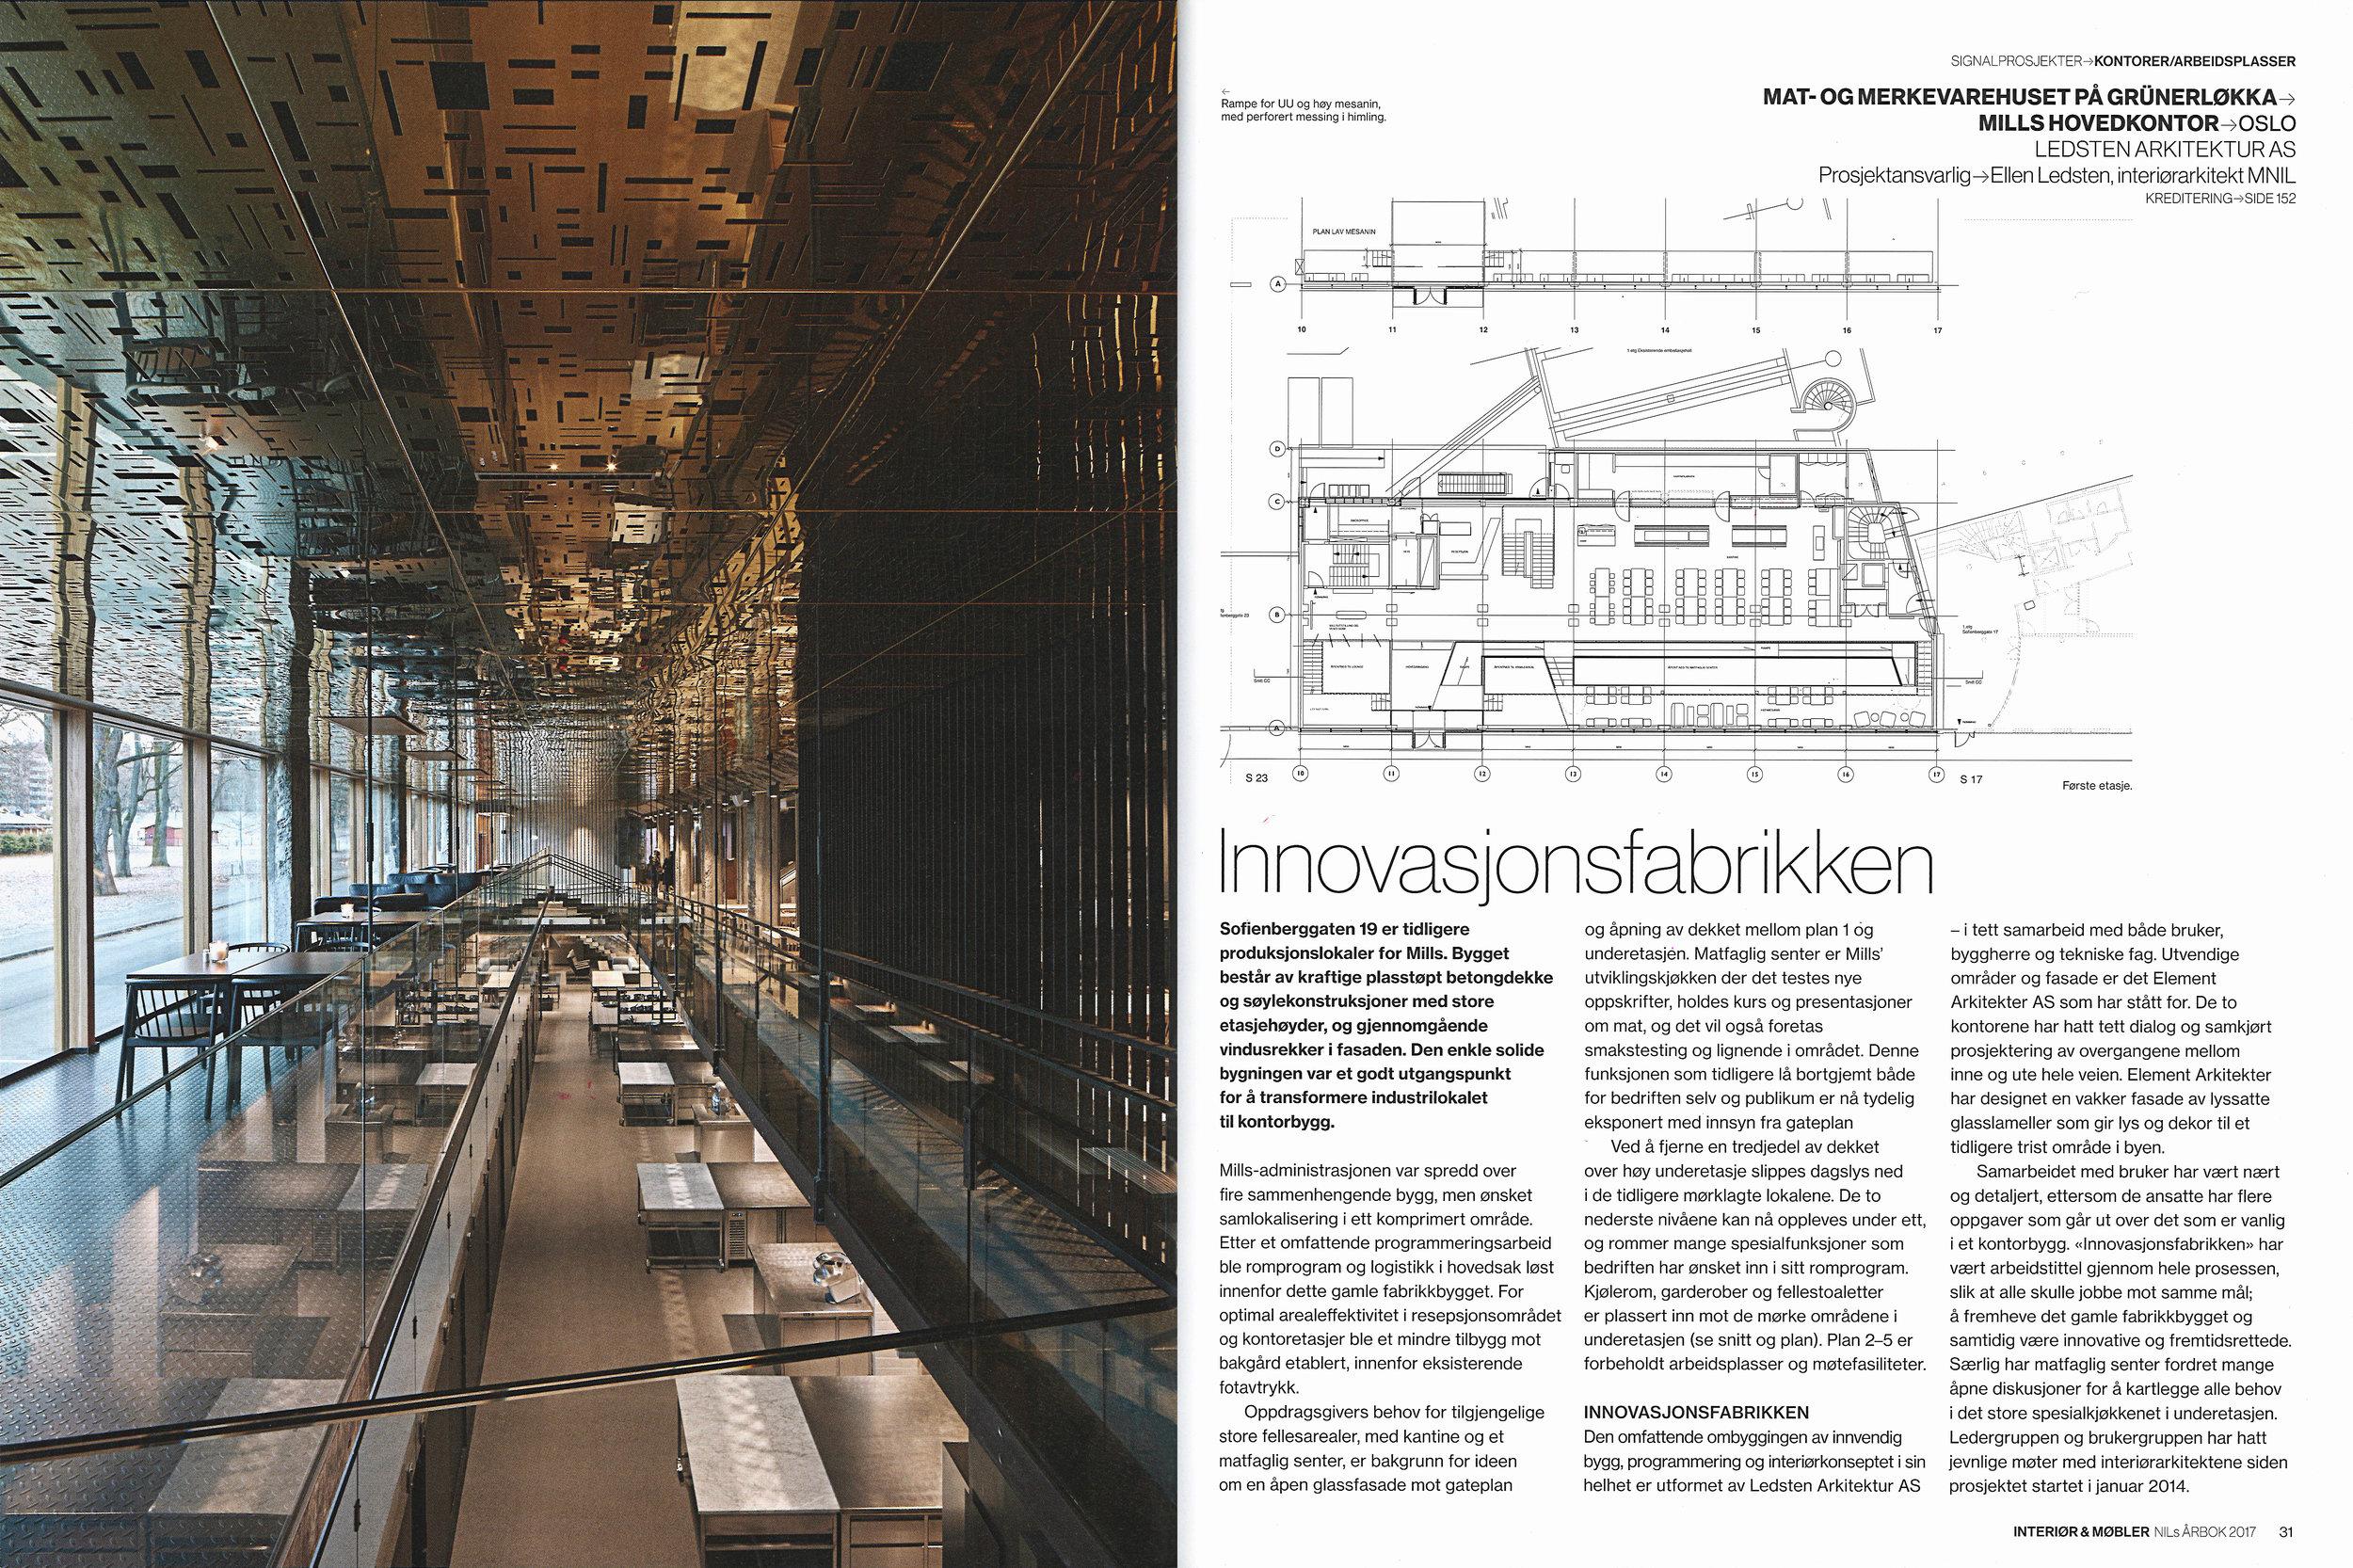 Interior-og-mobler-2017-30.31.jpg